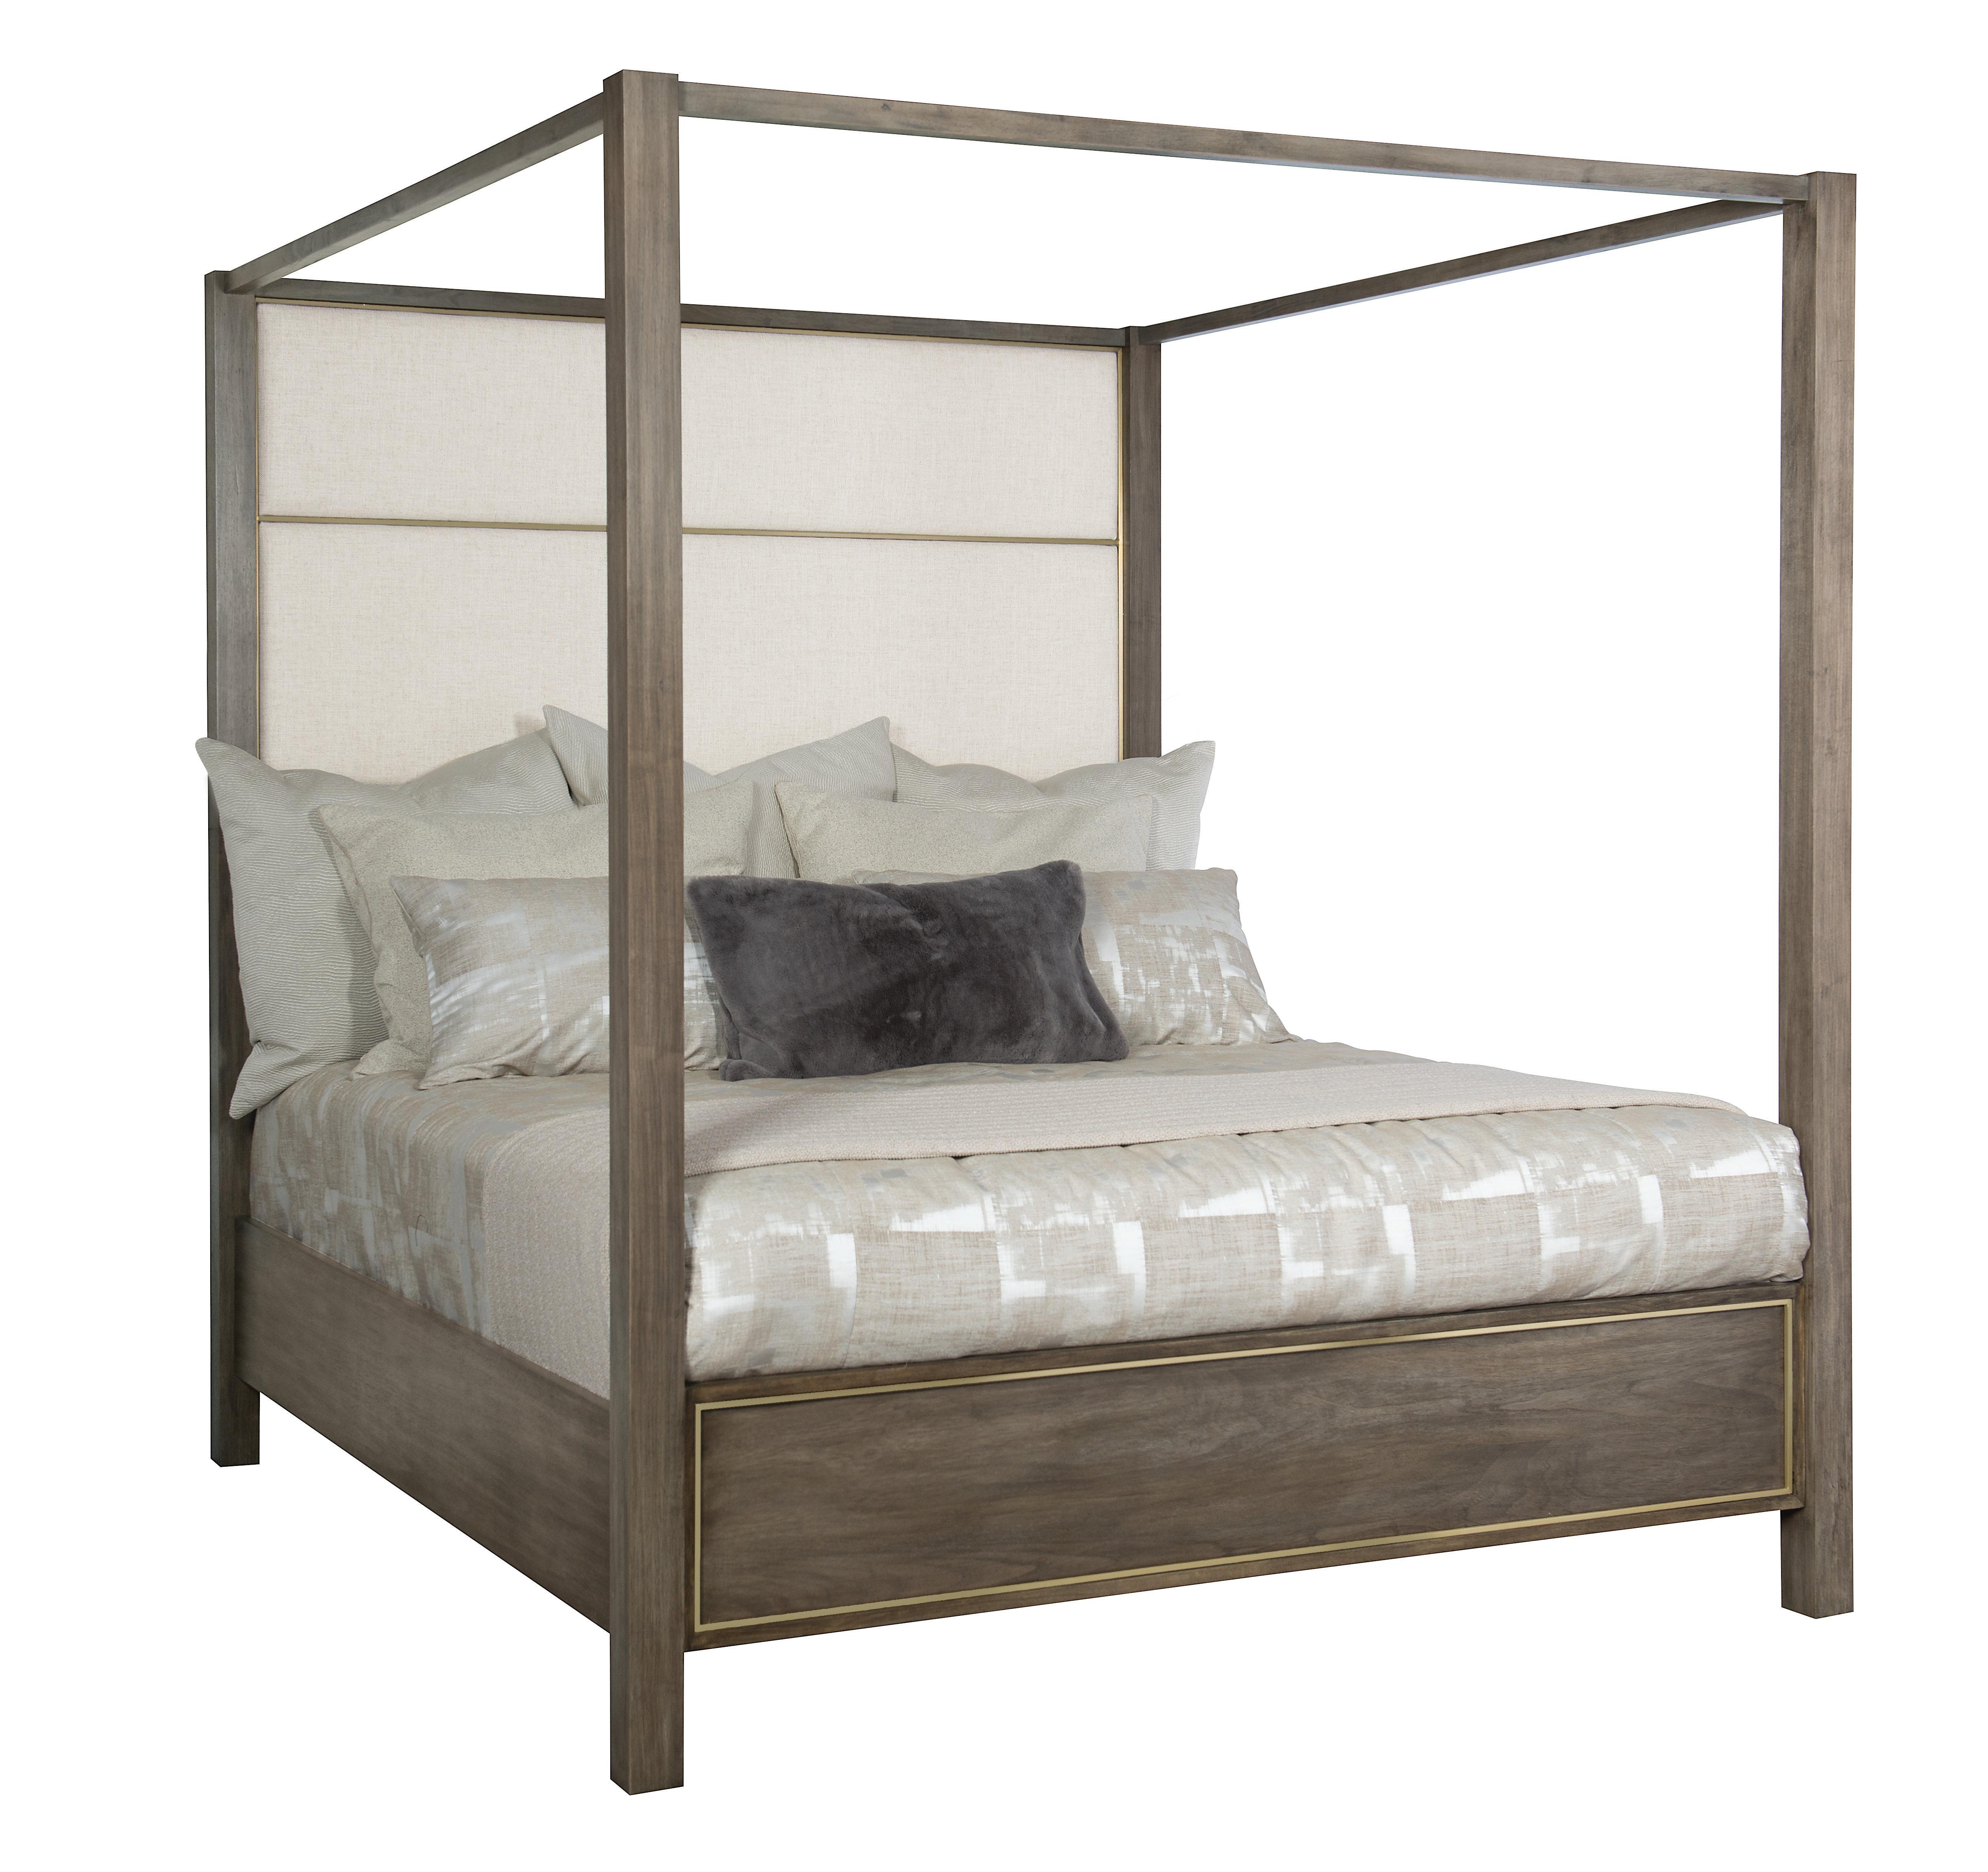 sc 1 st  Wayfair & Bernhardt Profile King Canopy Bed | Wayfair